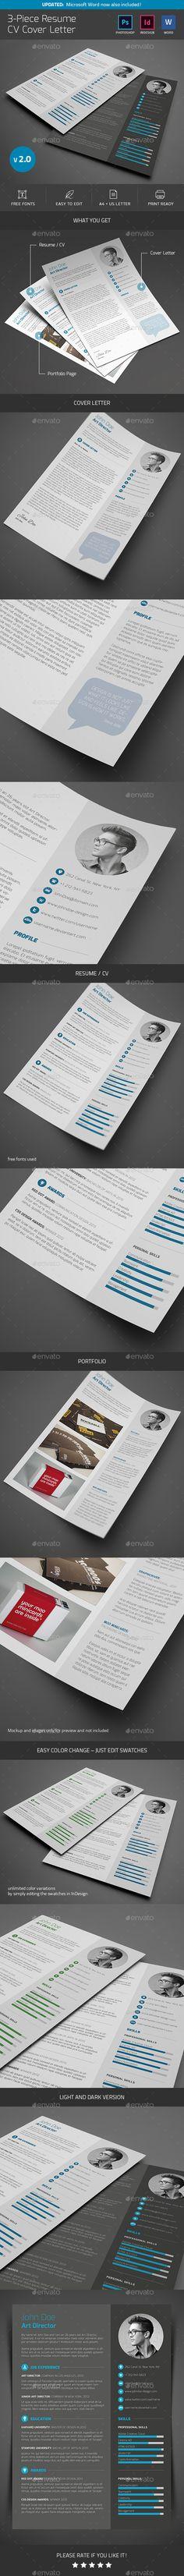 Pin by Christina Filippou on Resume CV Pinterest - professional fonts for resume